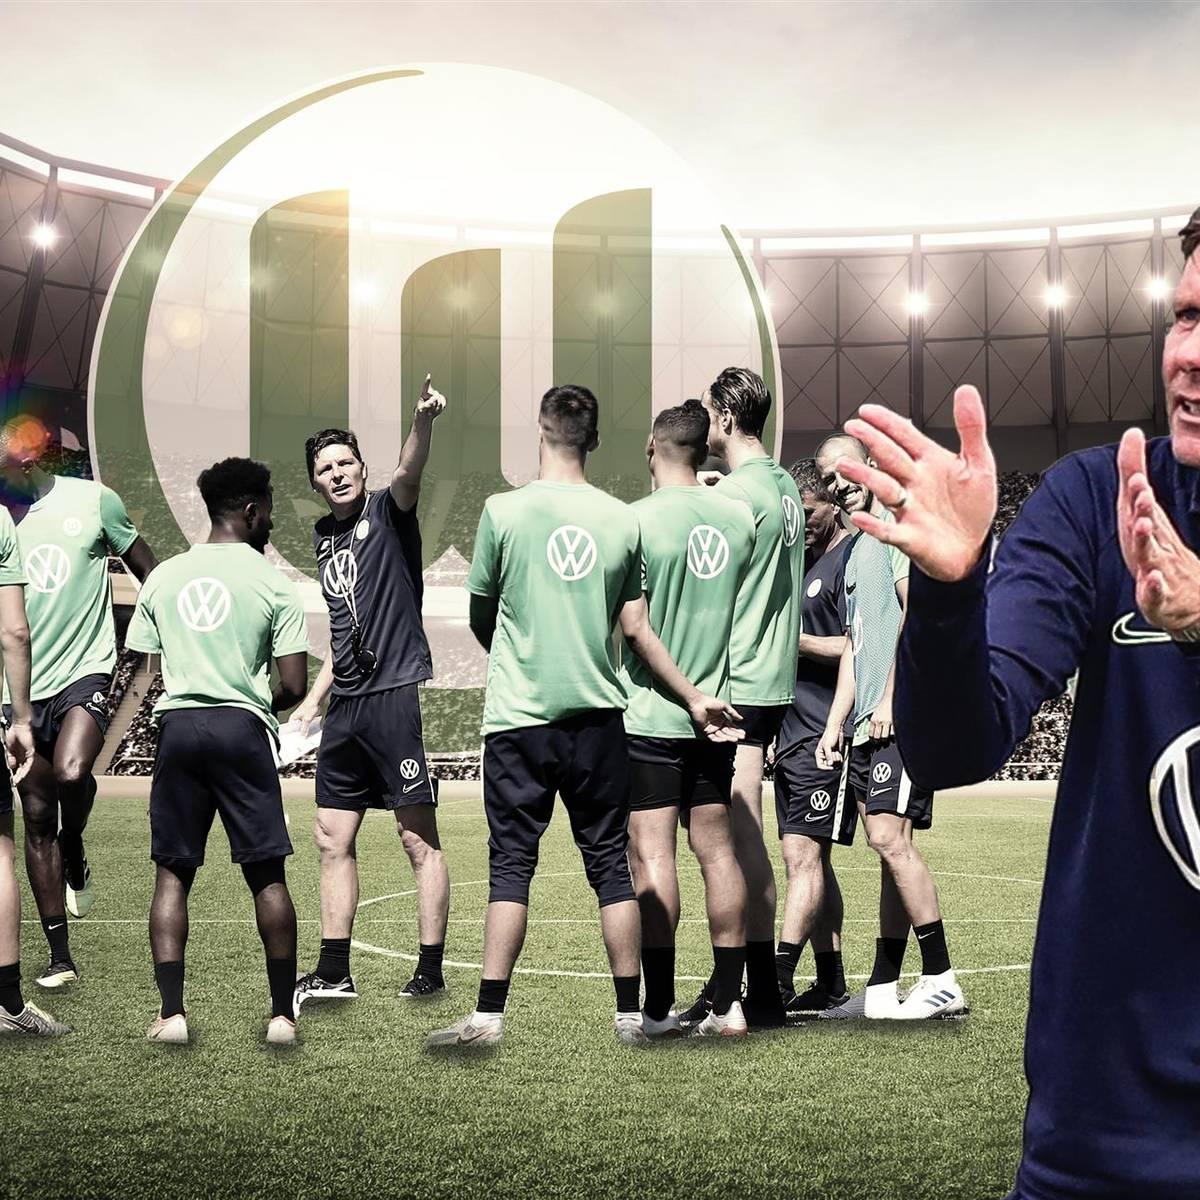 So tickt Wolfsburgs neuer Coach